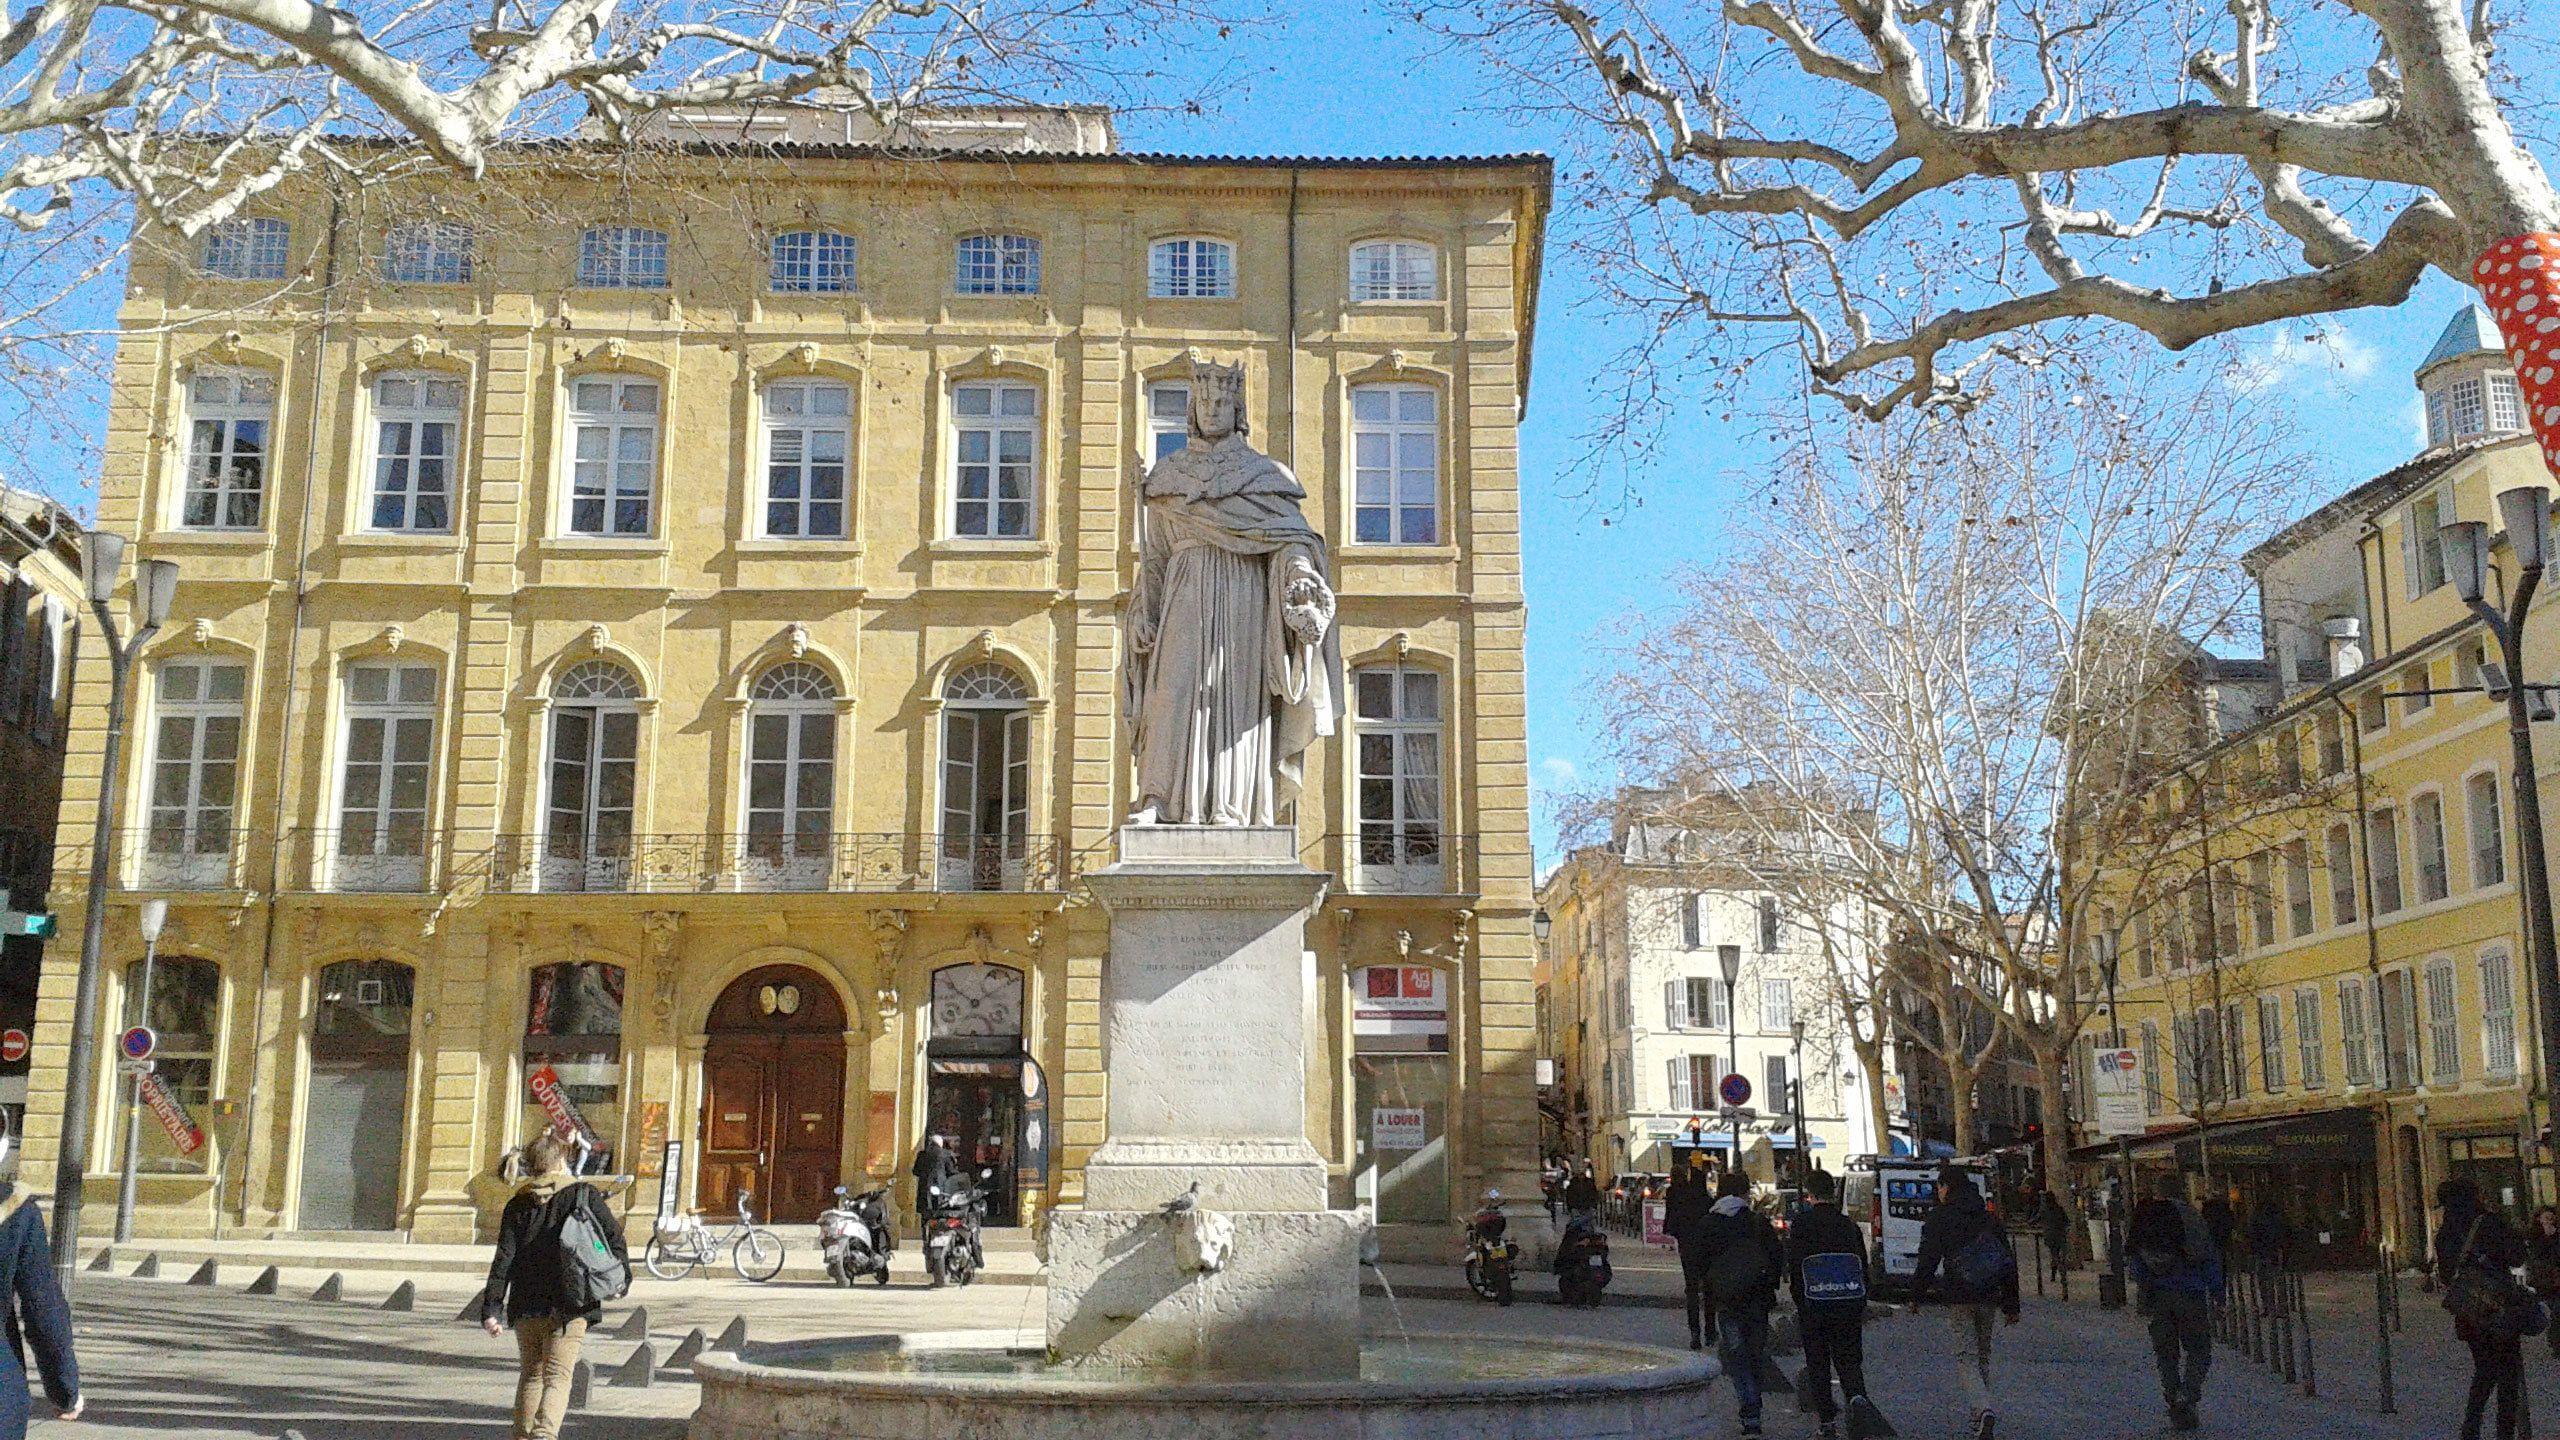 Street view of Aix-en-Provence